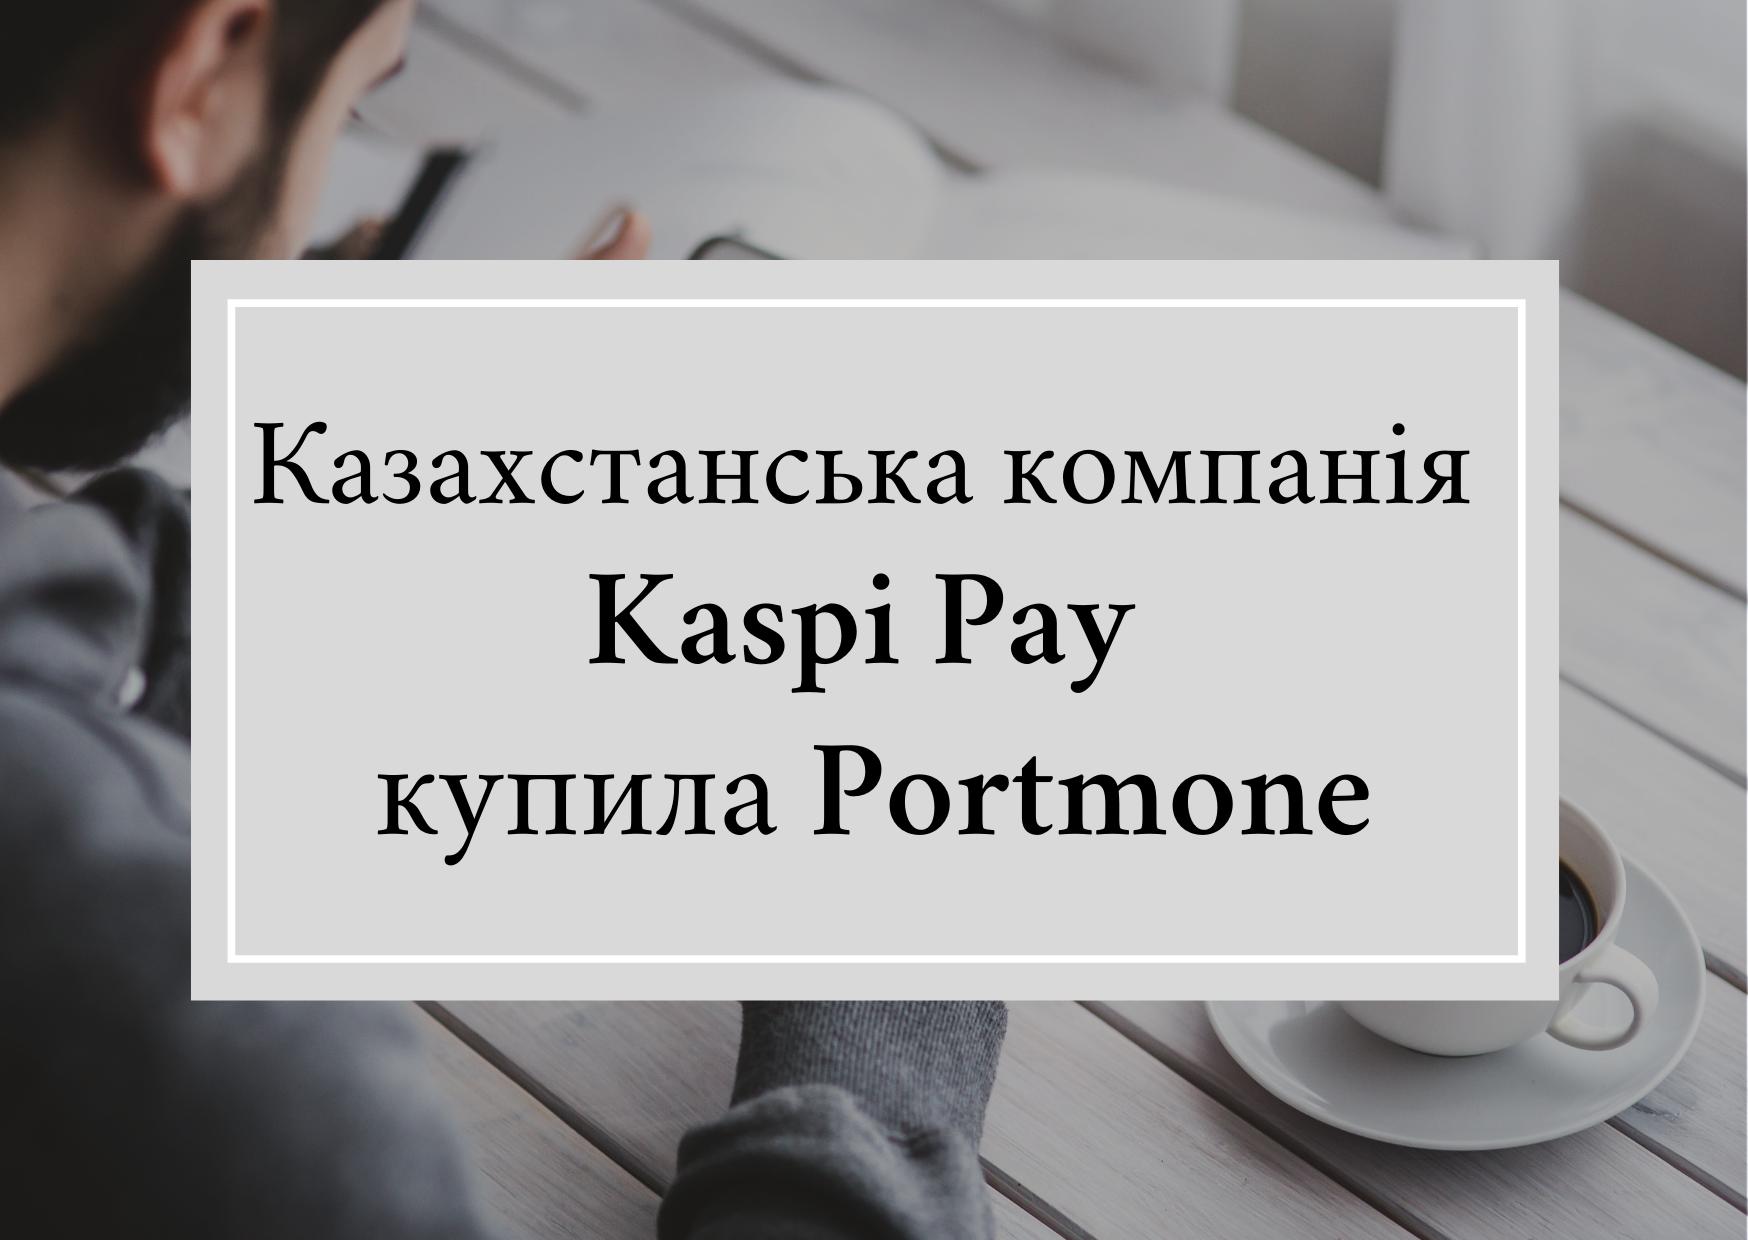 Kaspi-Pay купила Portmone